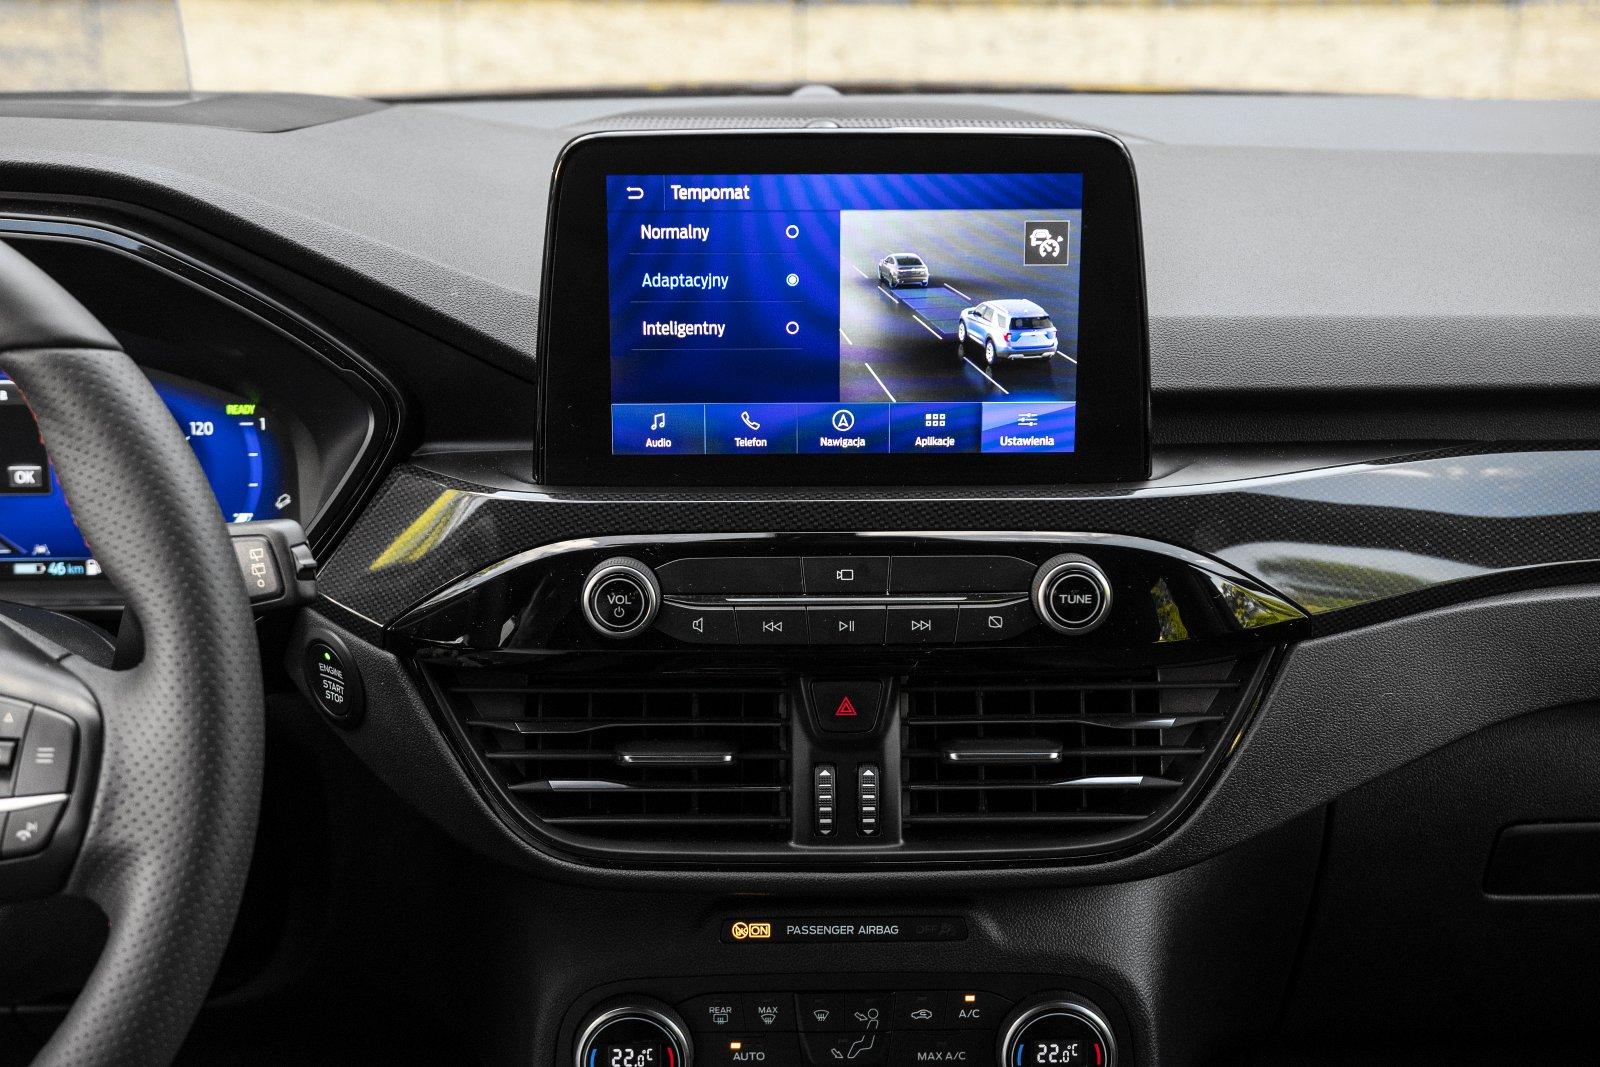 ford kuga plug-in hybrid 2021 systemy wspomagające